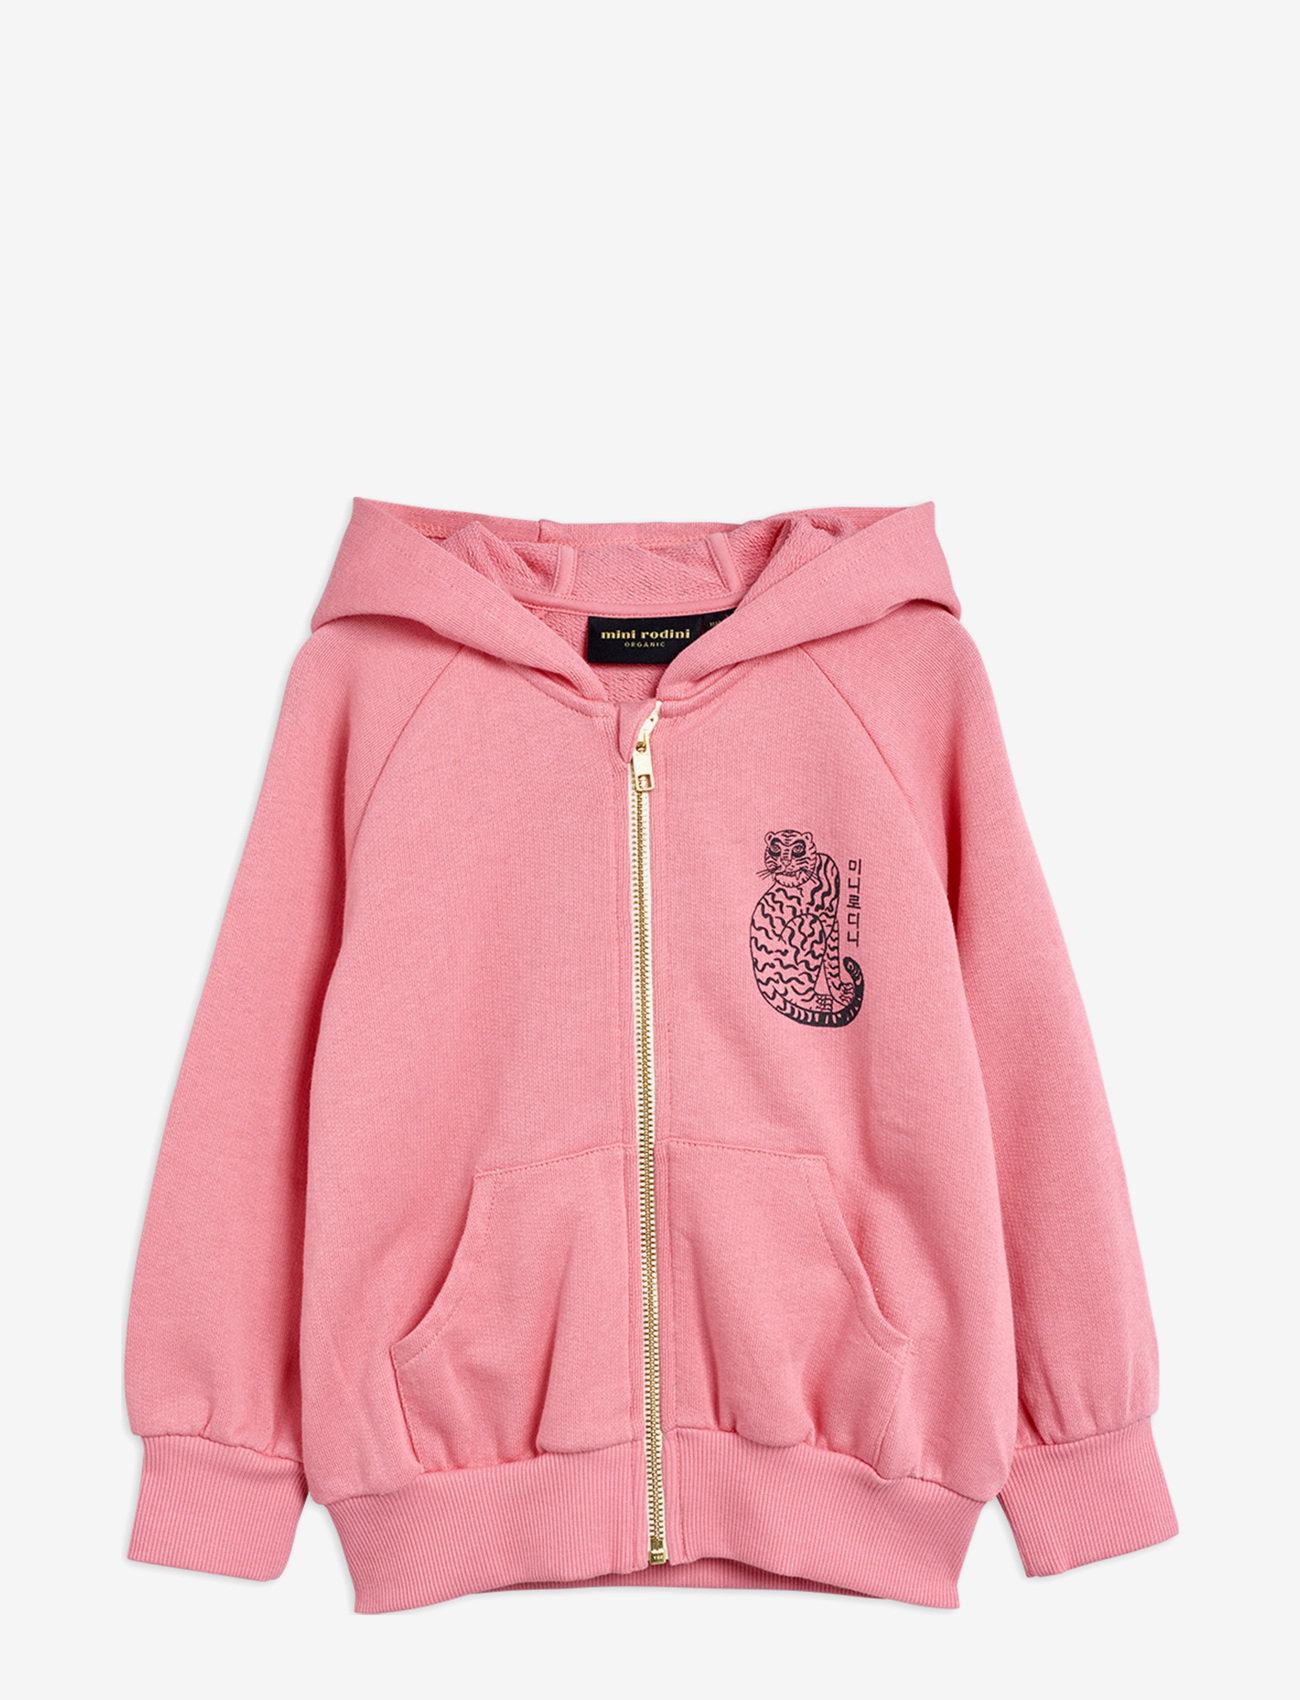 Mini Rodini - Tiger sp zip hoodie - sweatshirts - pink - 0